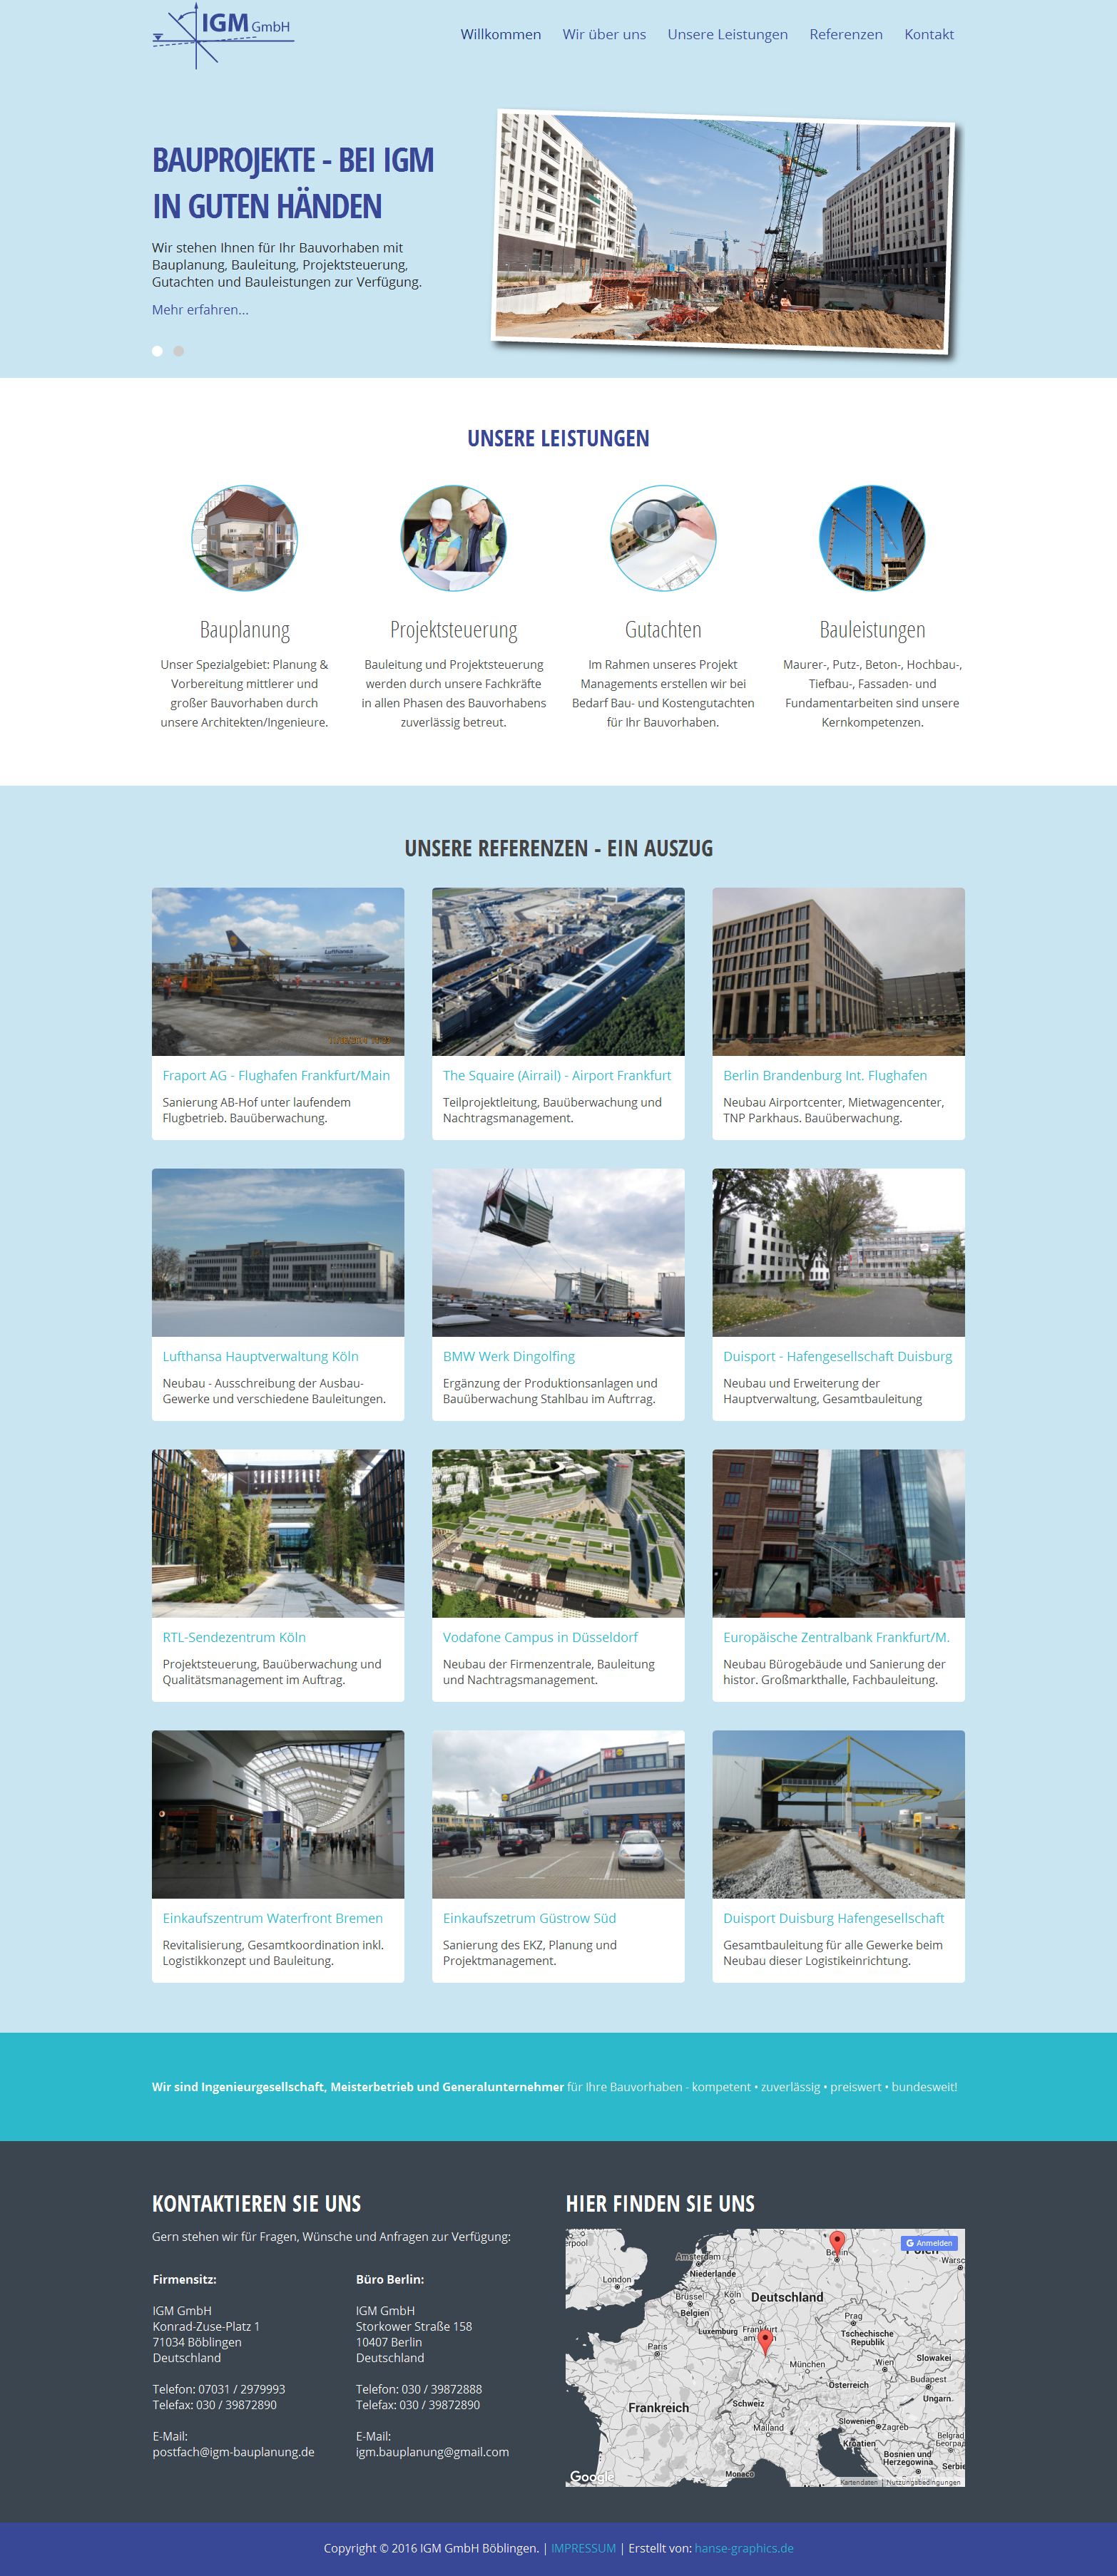 IGM GmbH